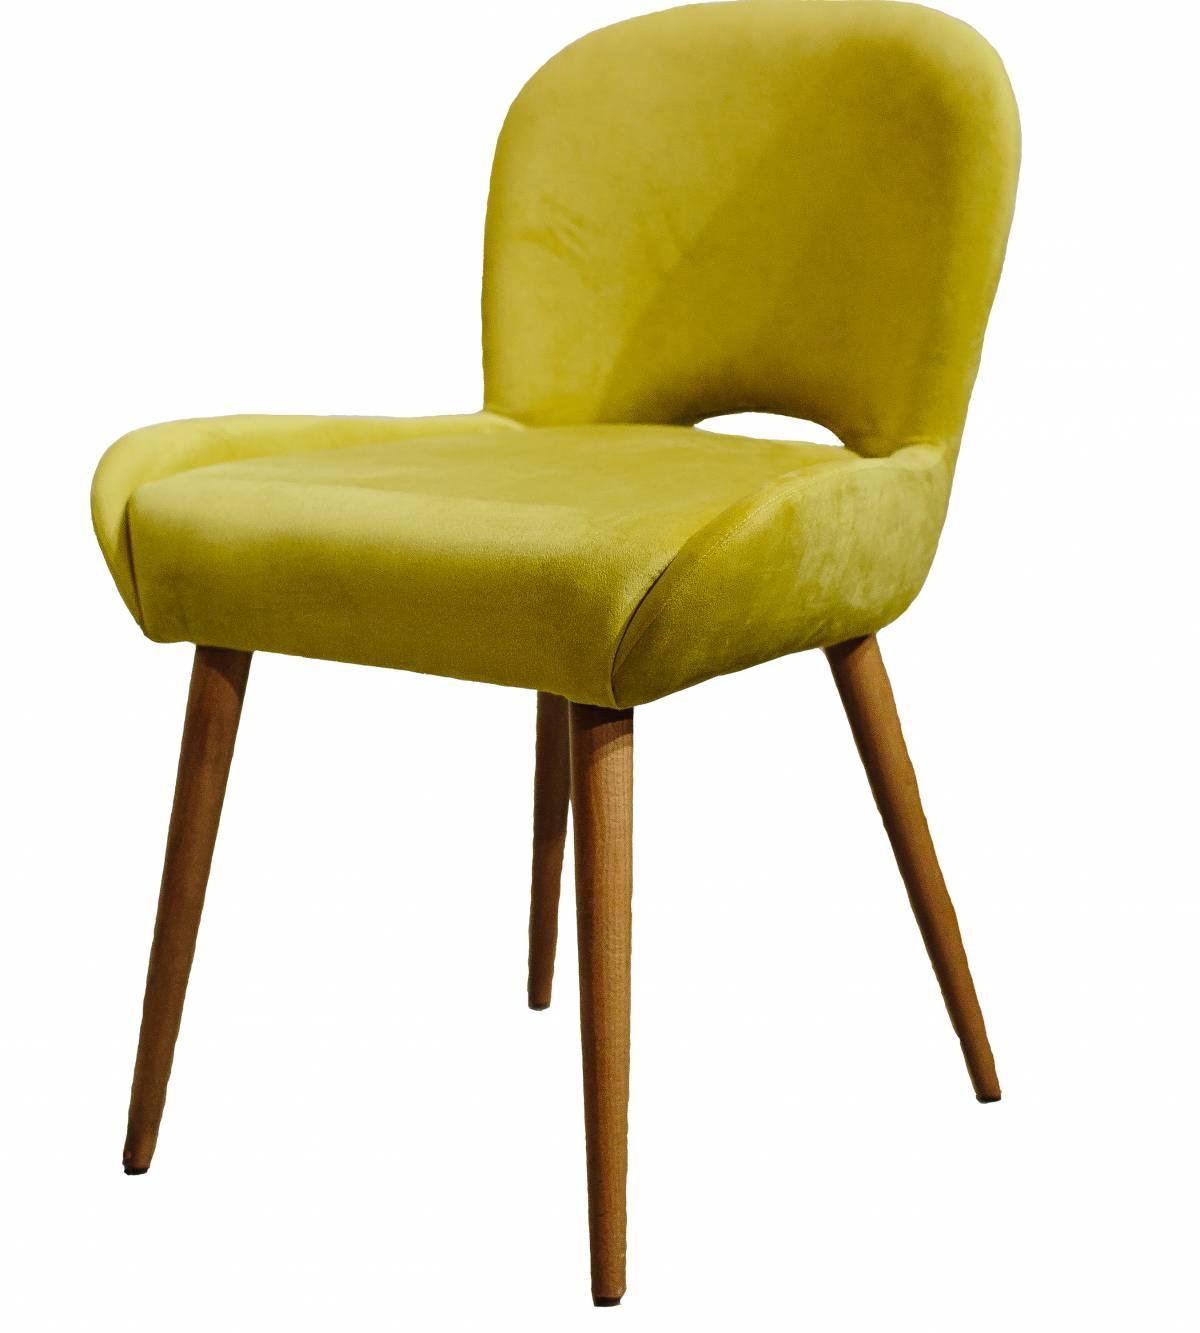 Купить стул Aniva в Raroom